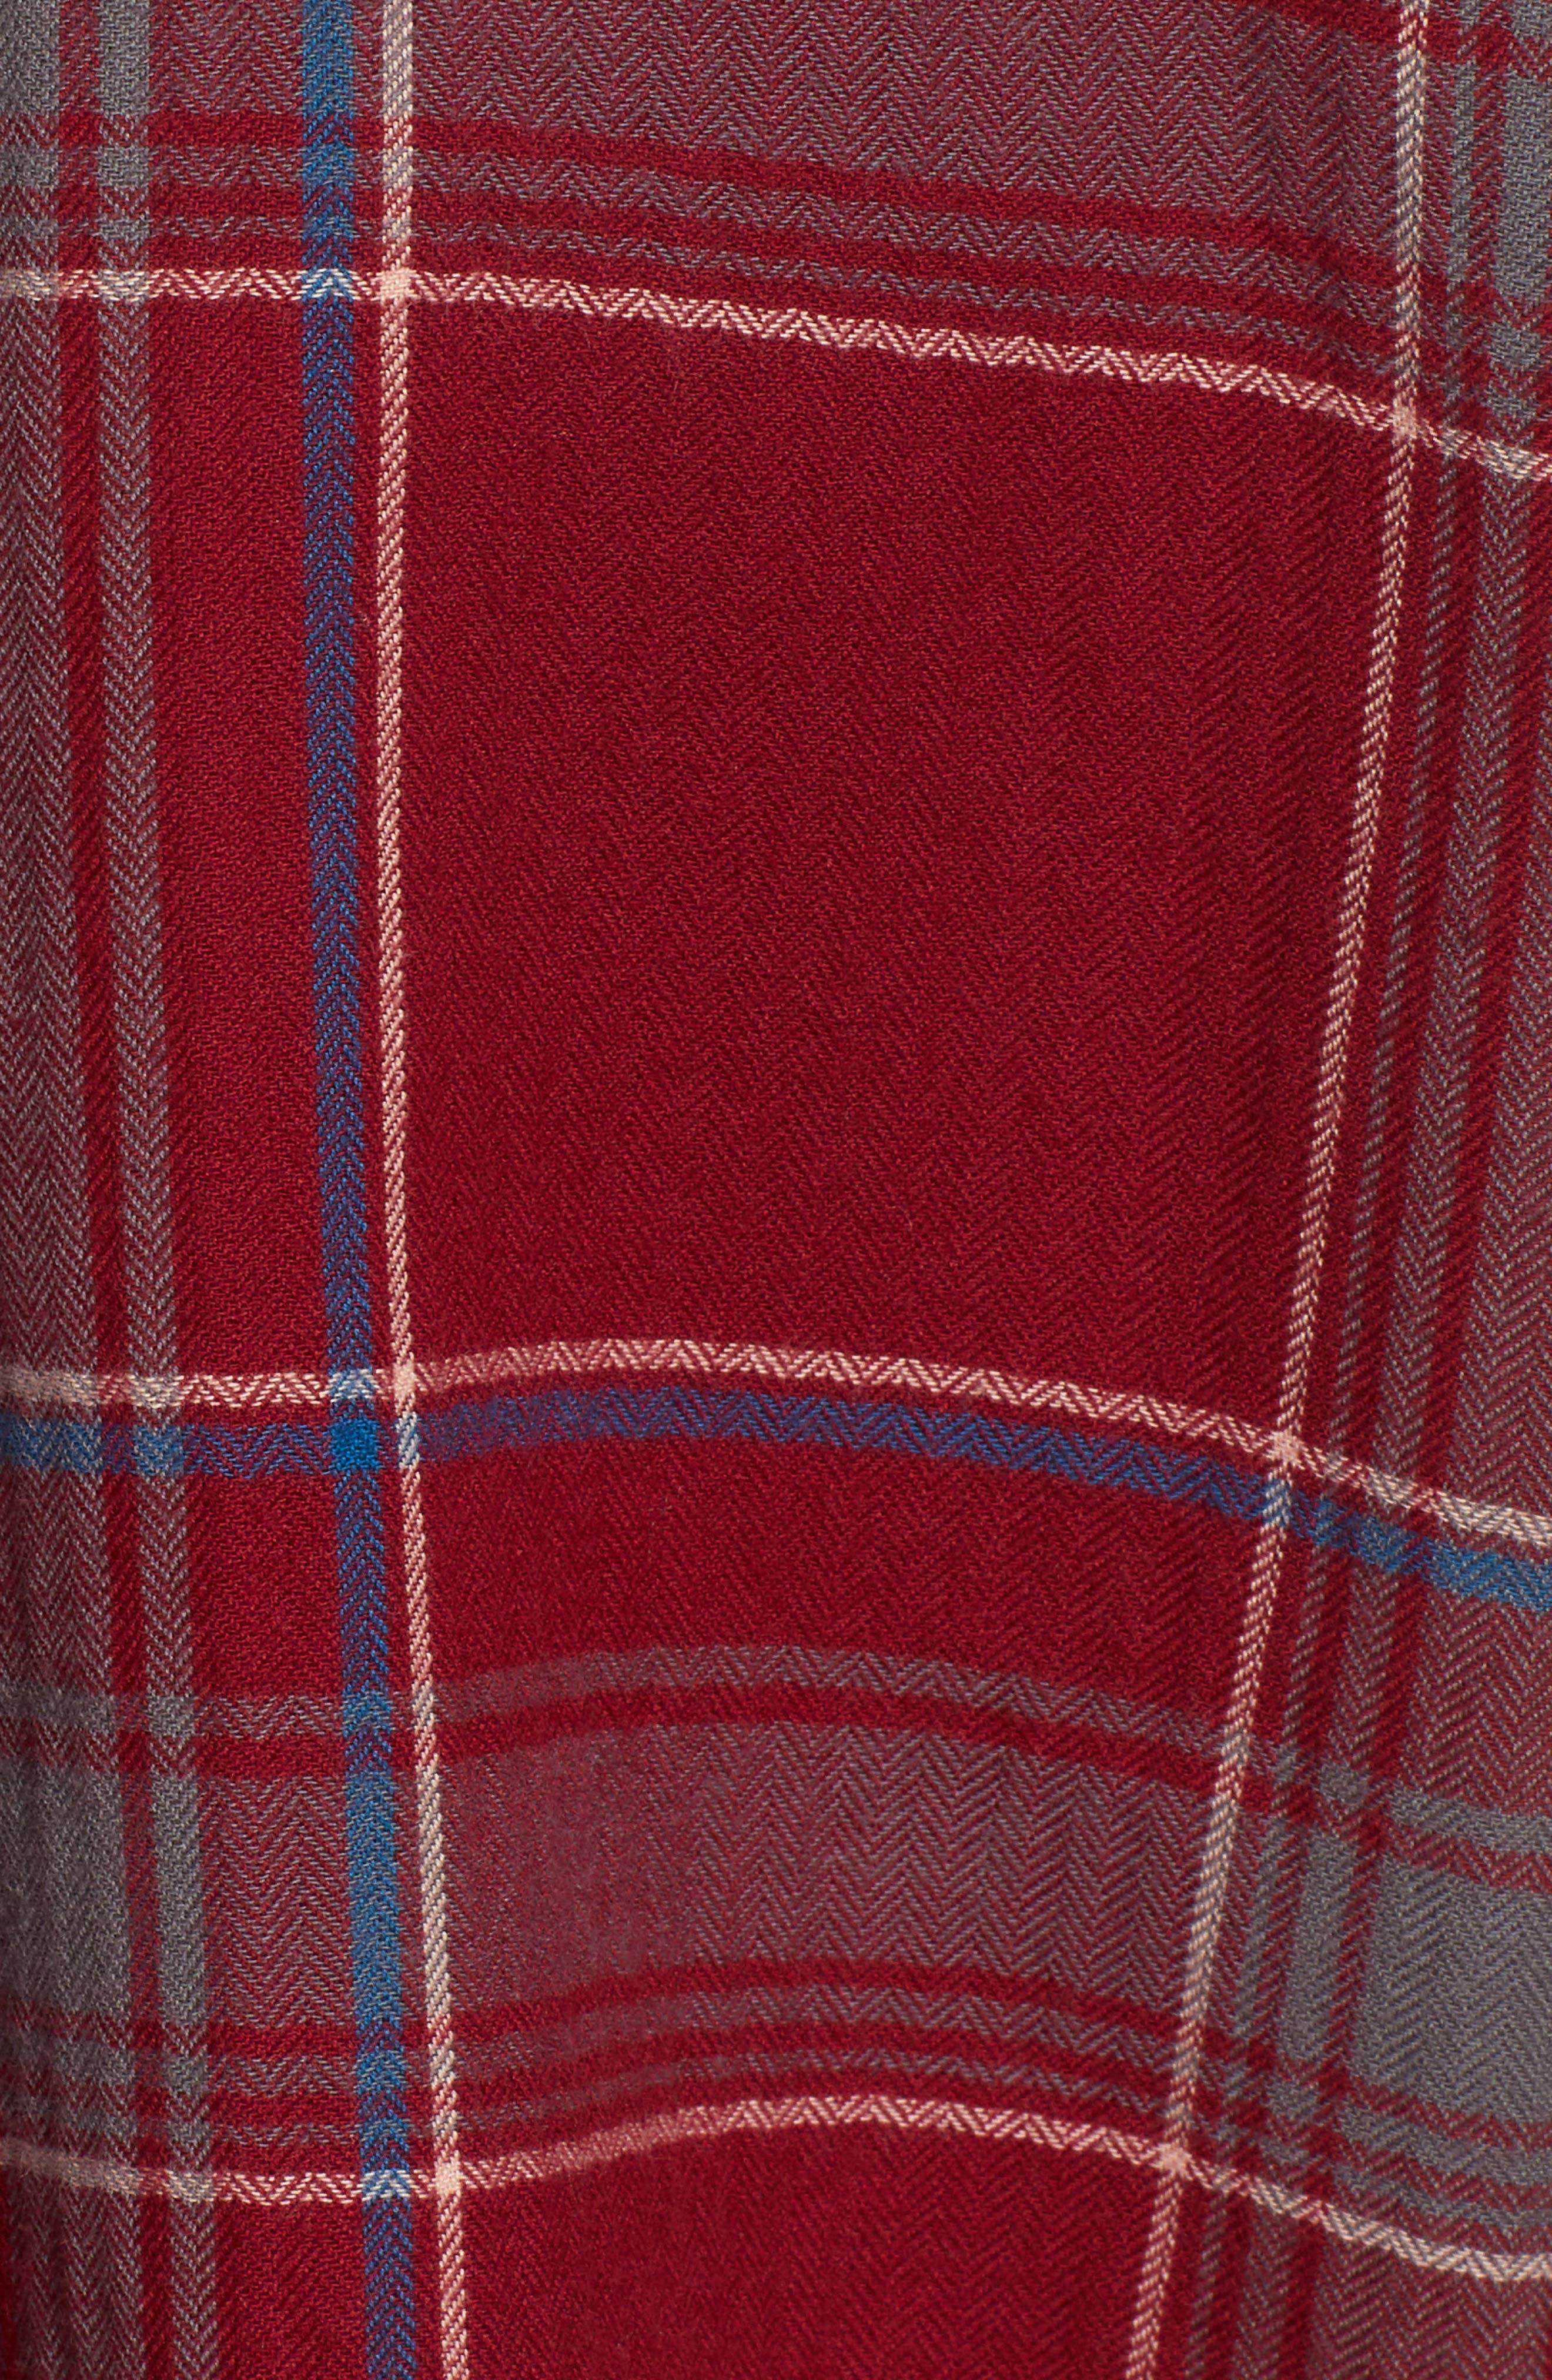 Frayed Edge Plaid Shirt,                             Alternate thumbnail 7, color,                             RED RUMBA NICOLE PLAID